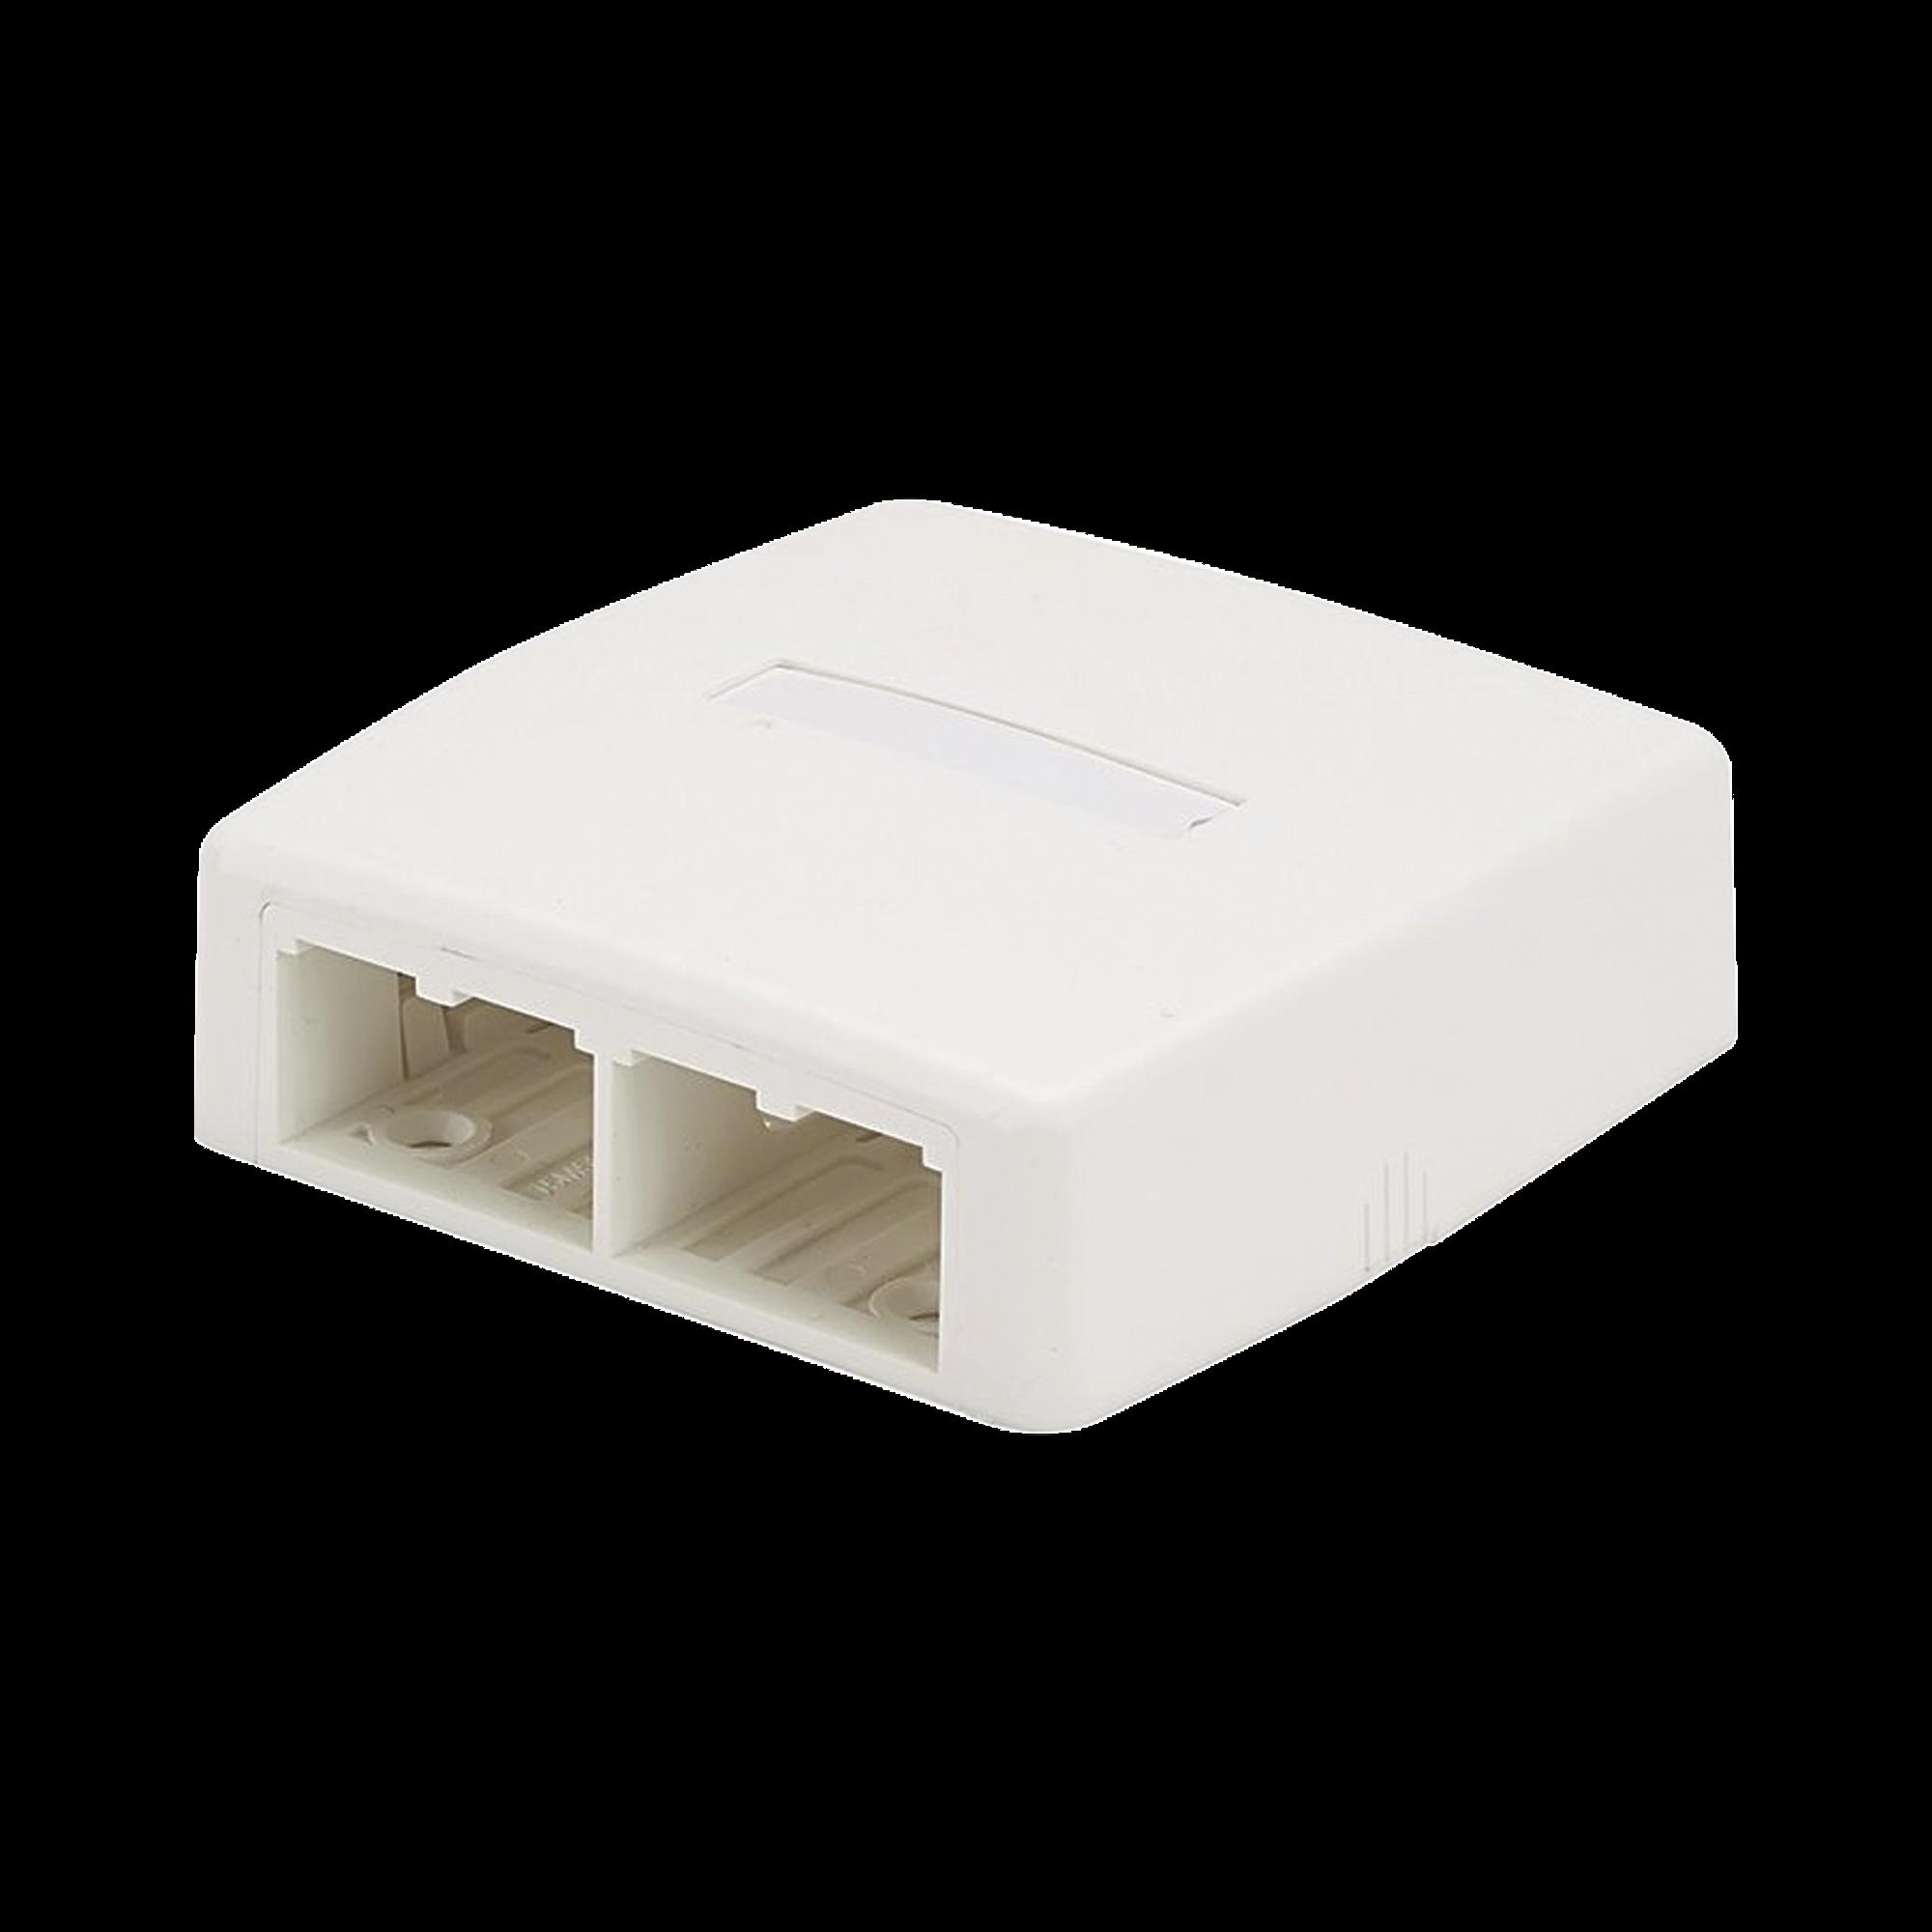 Caja de Montaje en Superficie, Para 4 Módulos Mini-Com, Color Blanco Mate